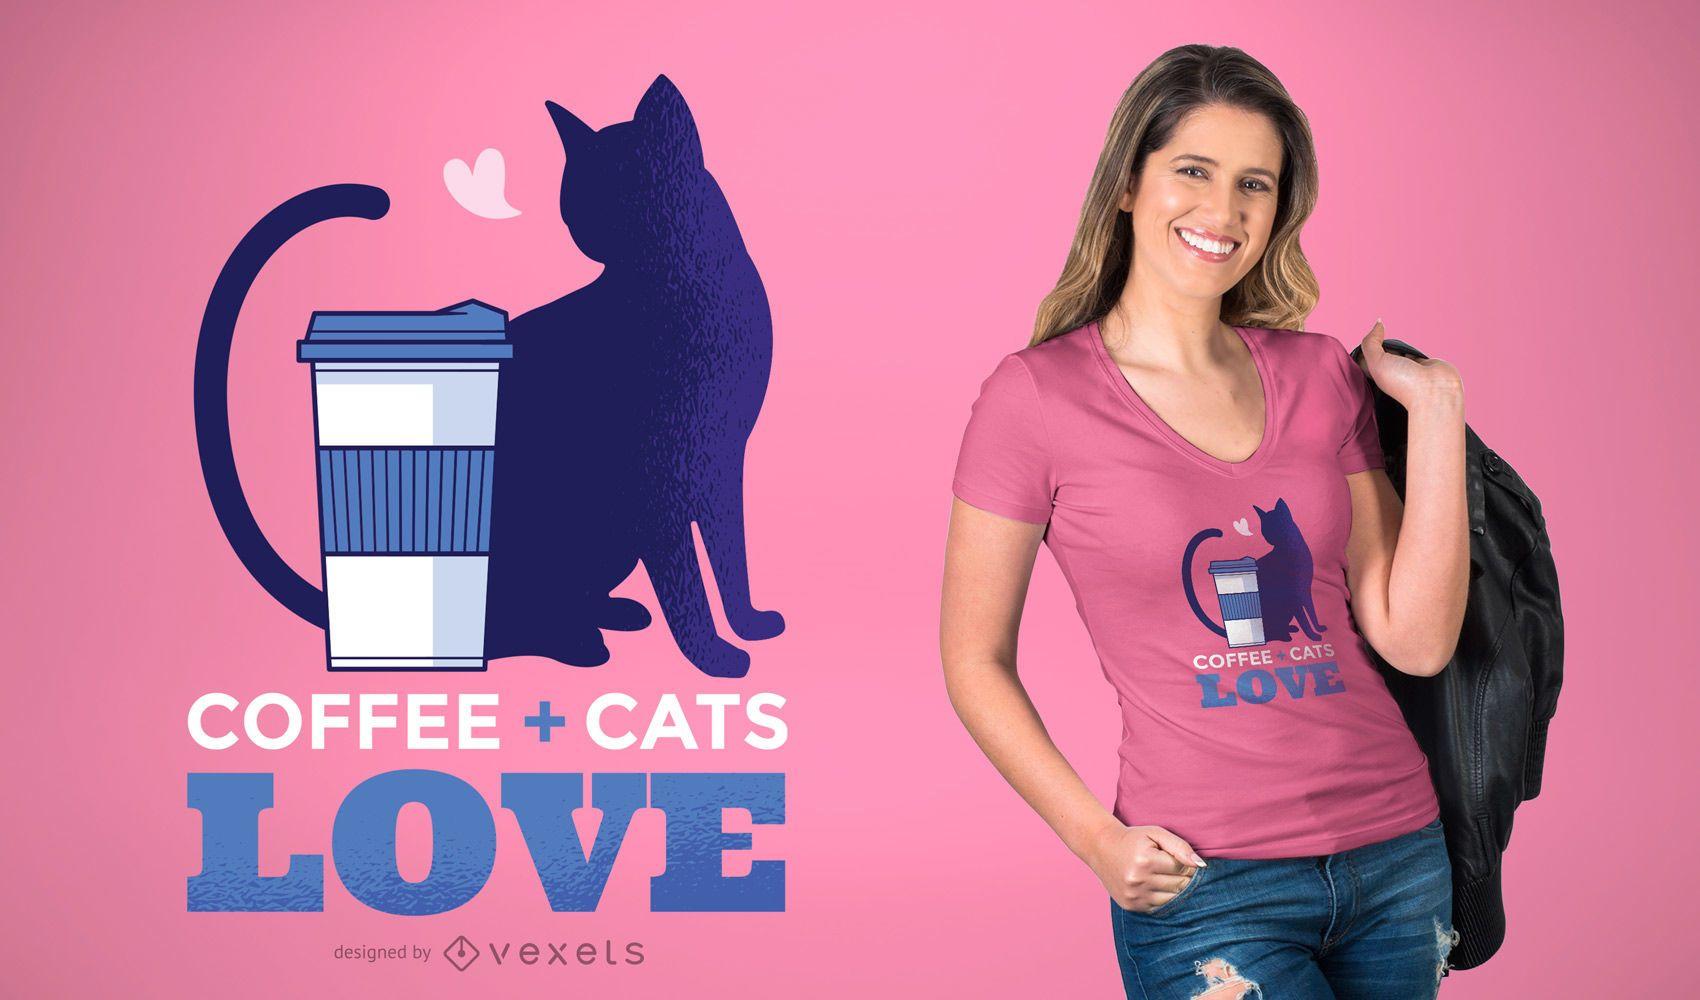 Coffee+Cats Love T-shirt Design